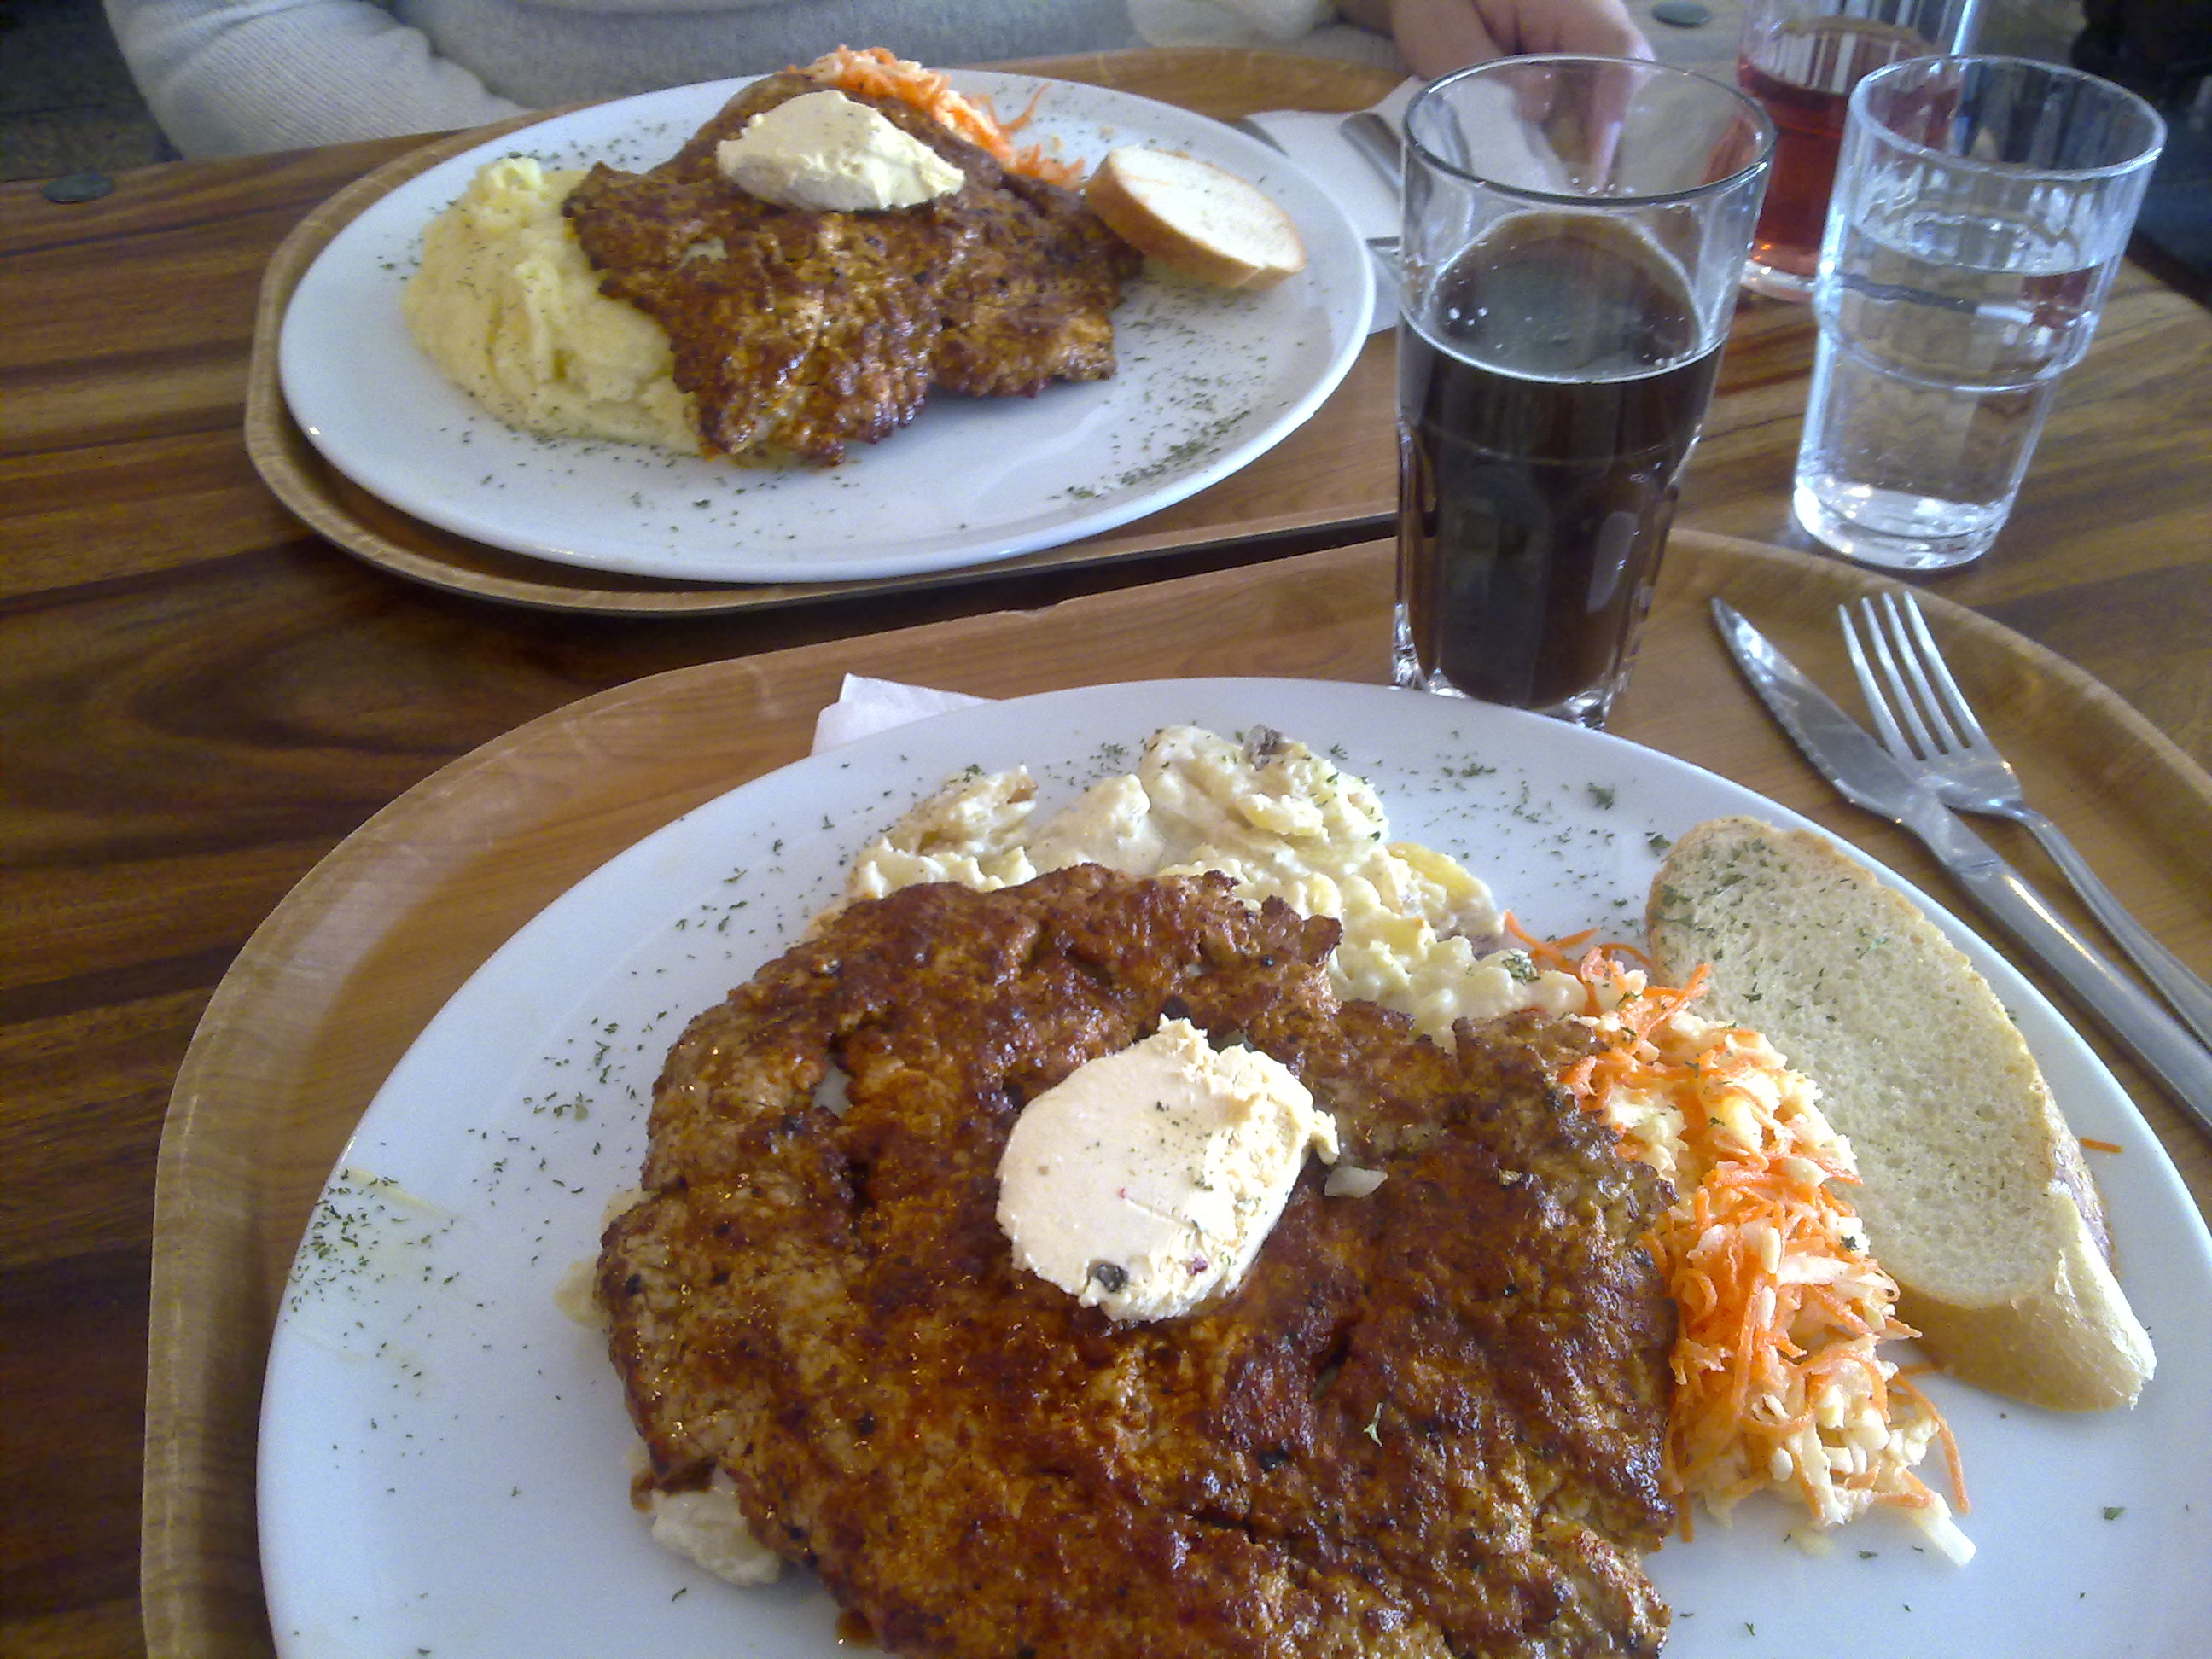 Pihvitupa Viikinki, Joensuu: 200g porsaan-fileepihvi + auraperunat + maustevoi